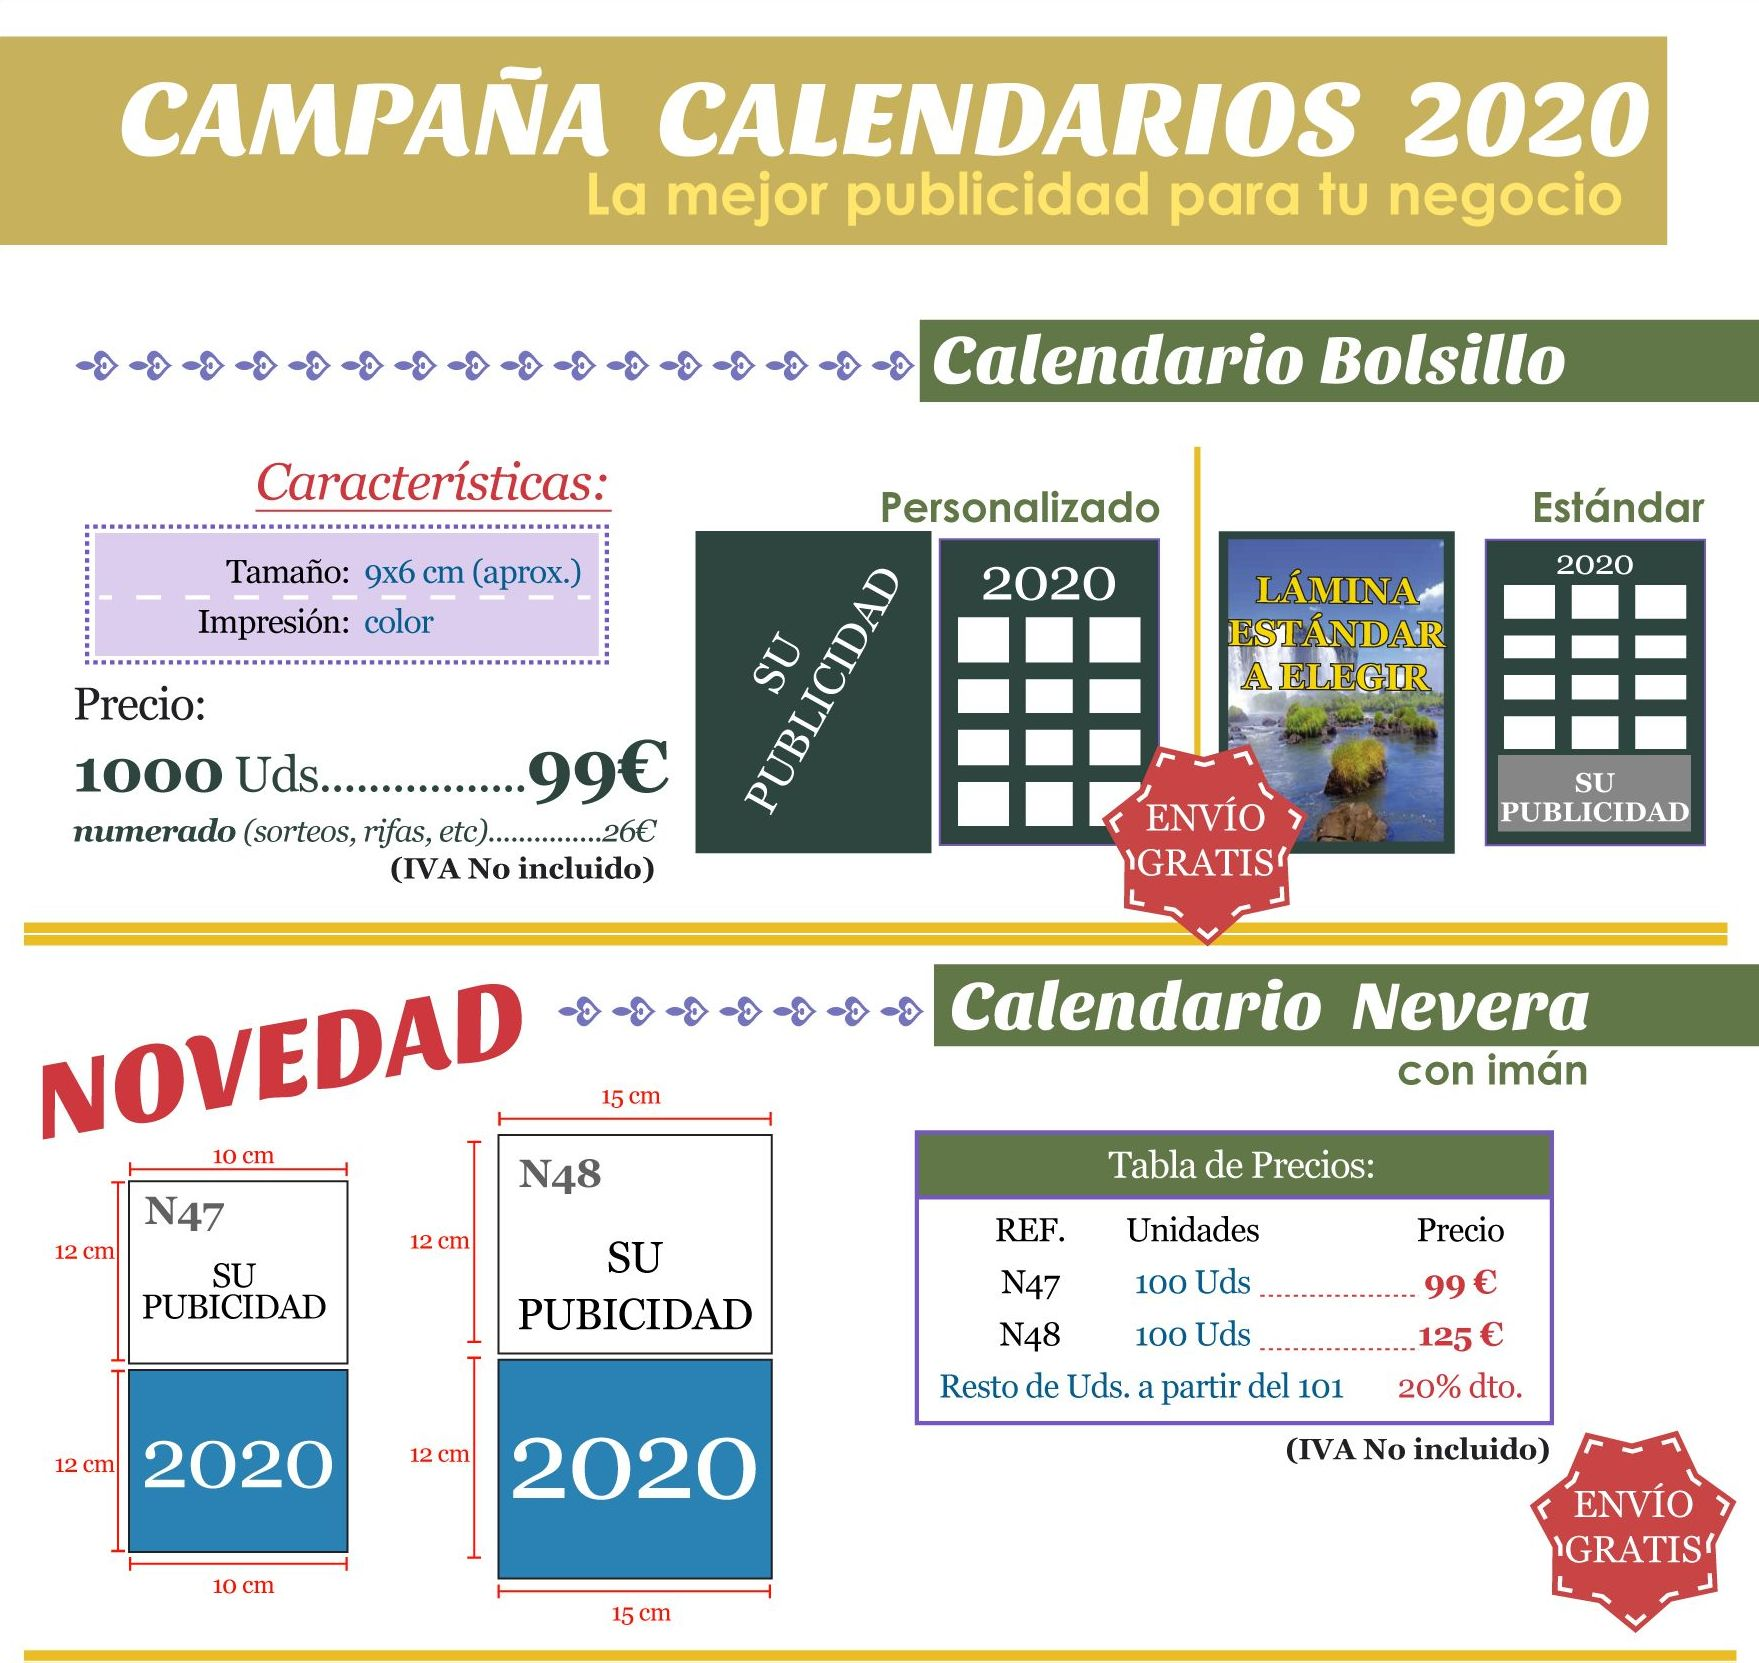 CAMPAÑA DE CALENDARIOS 2020: Productos de Impresos Levante